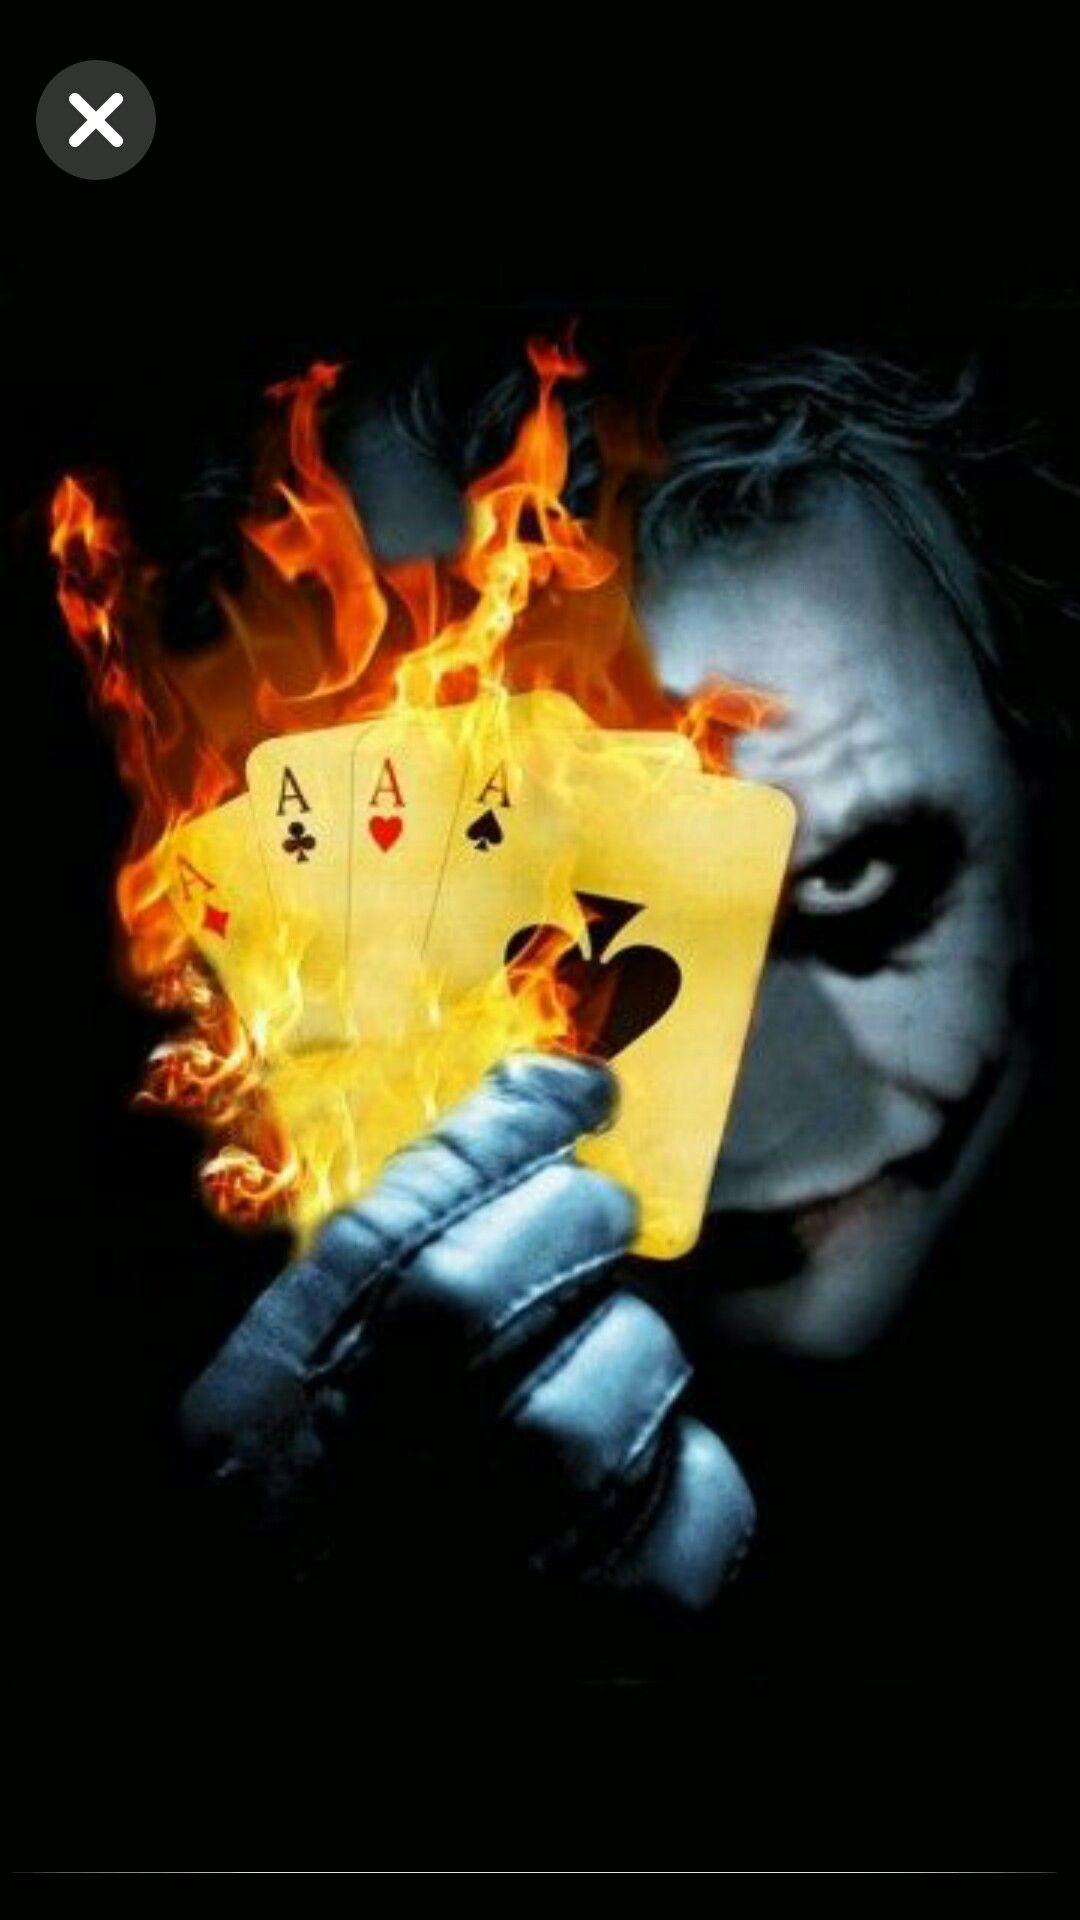 Pin By Aditi Rajput On Joker Joker Wallpapers Joker Images Joker